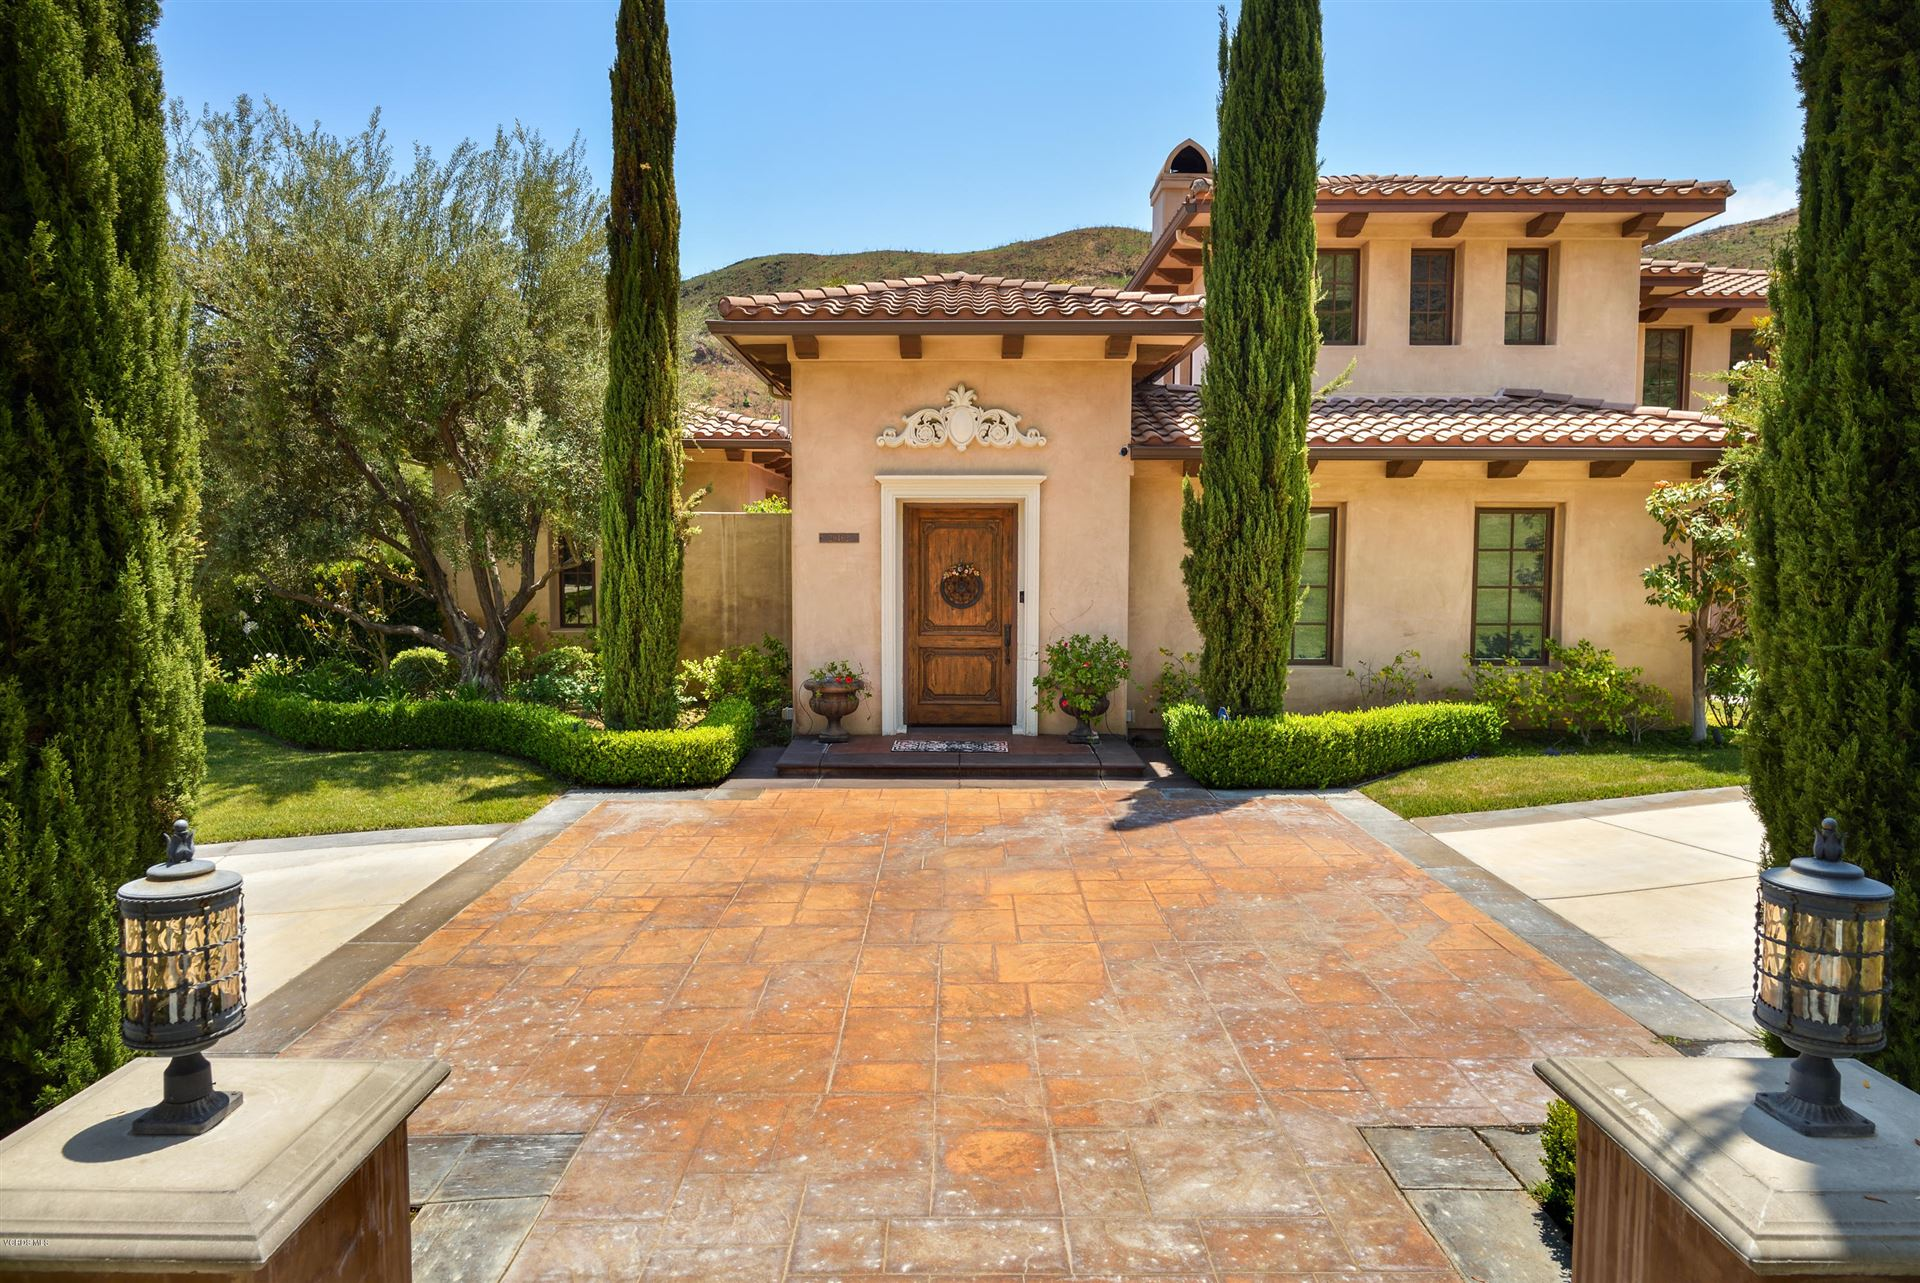 29462 Malibu View Court, Agoura Hills, CA 91301 - MLS#: 220010898